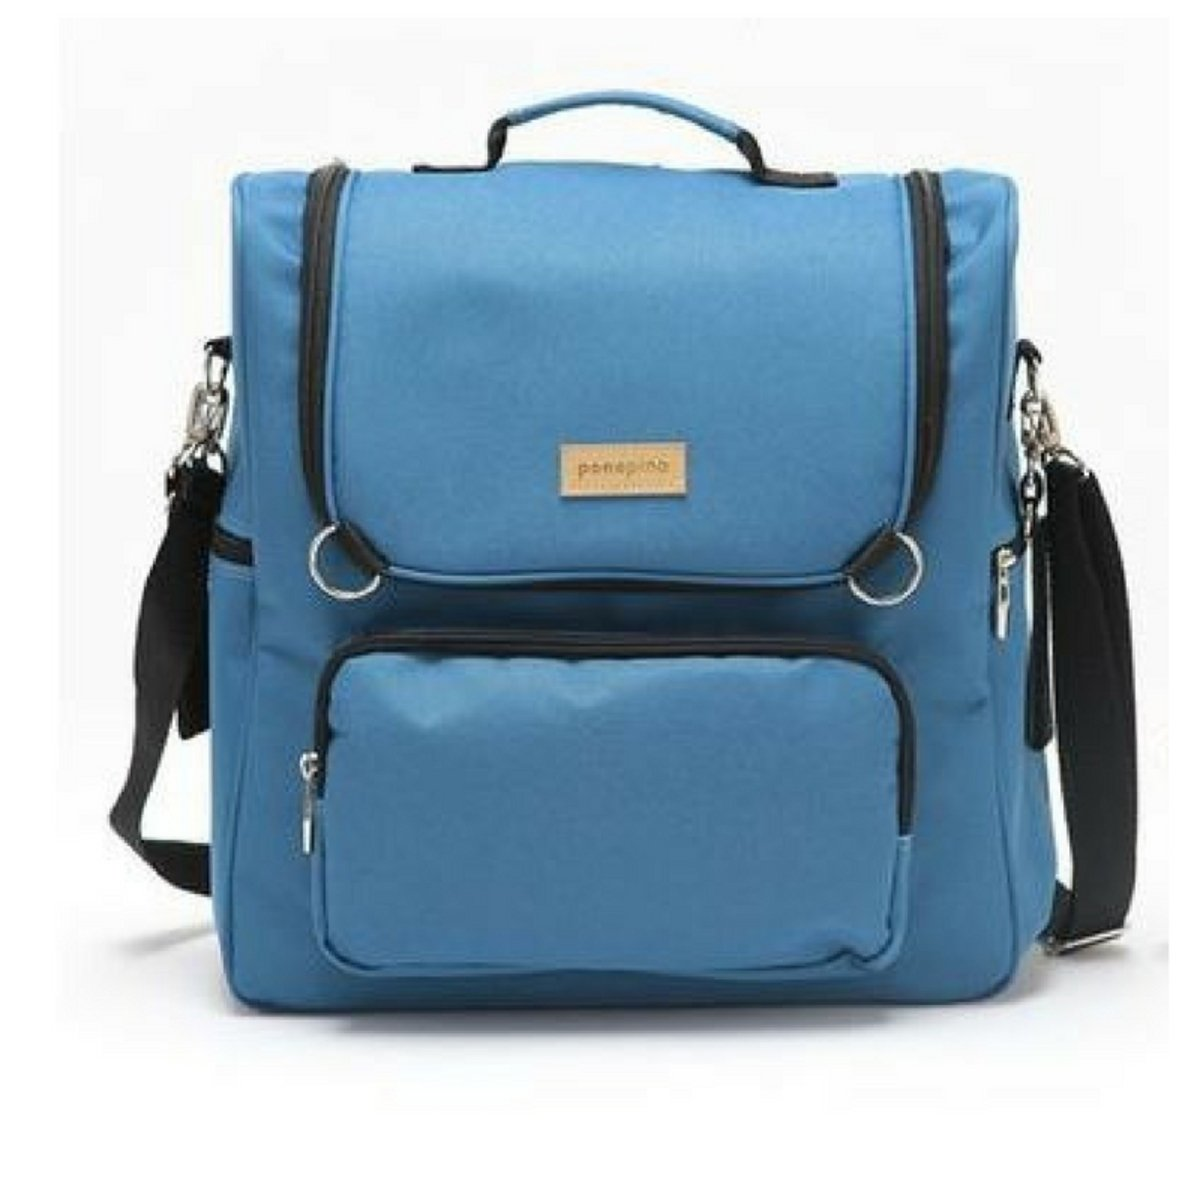 Ponopino防水背囊 (藍色)_Premium2